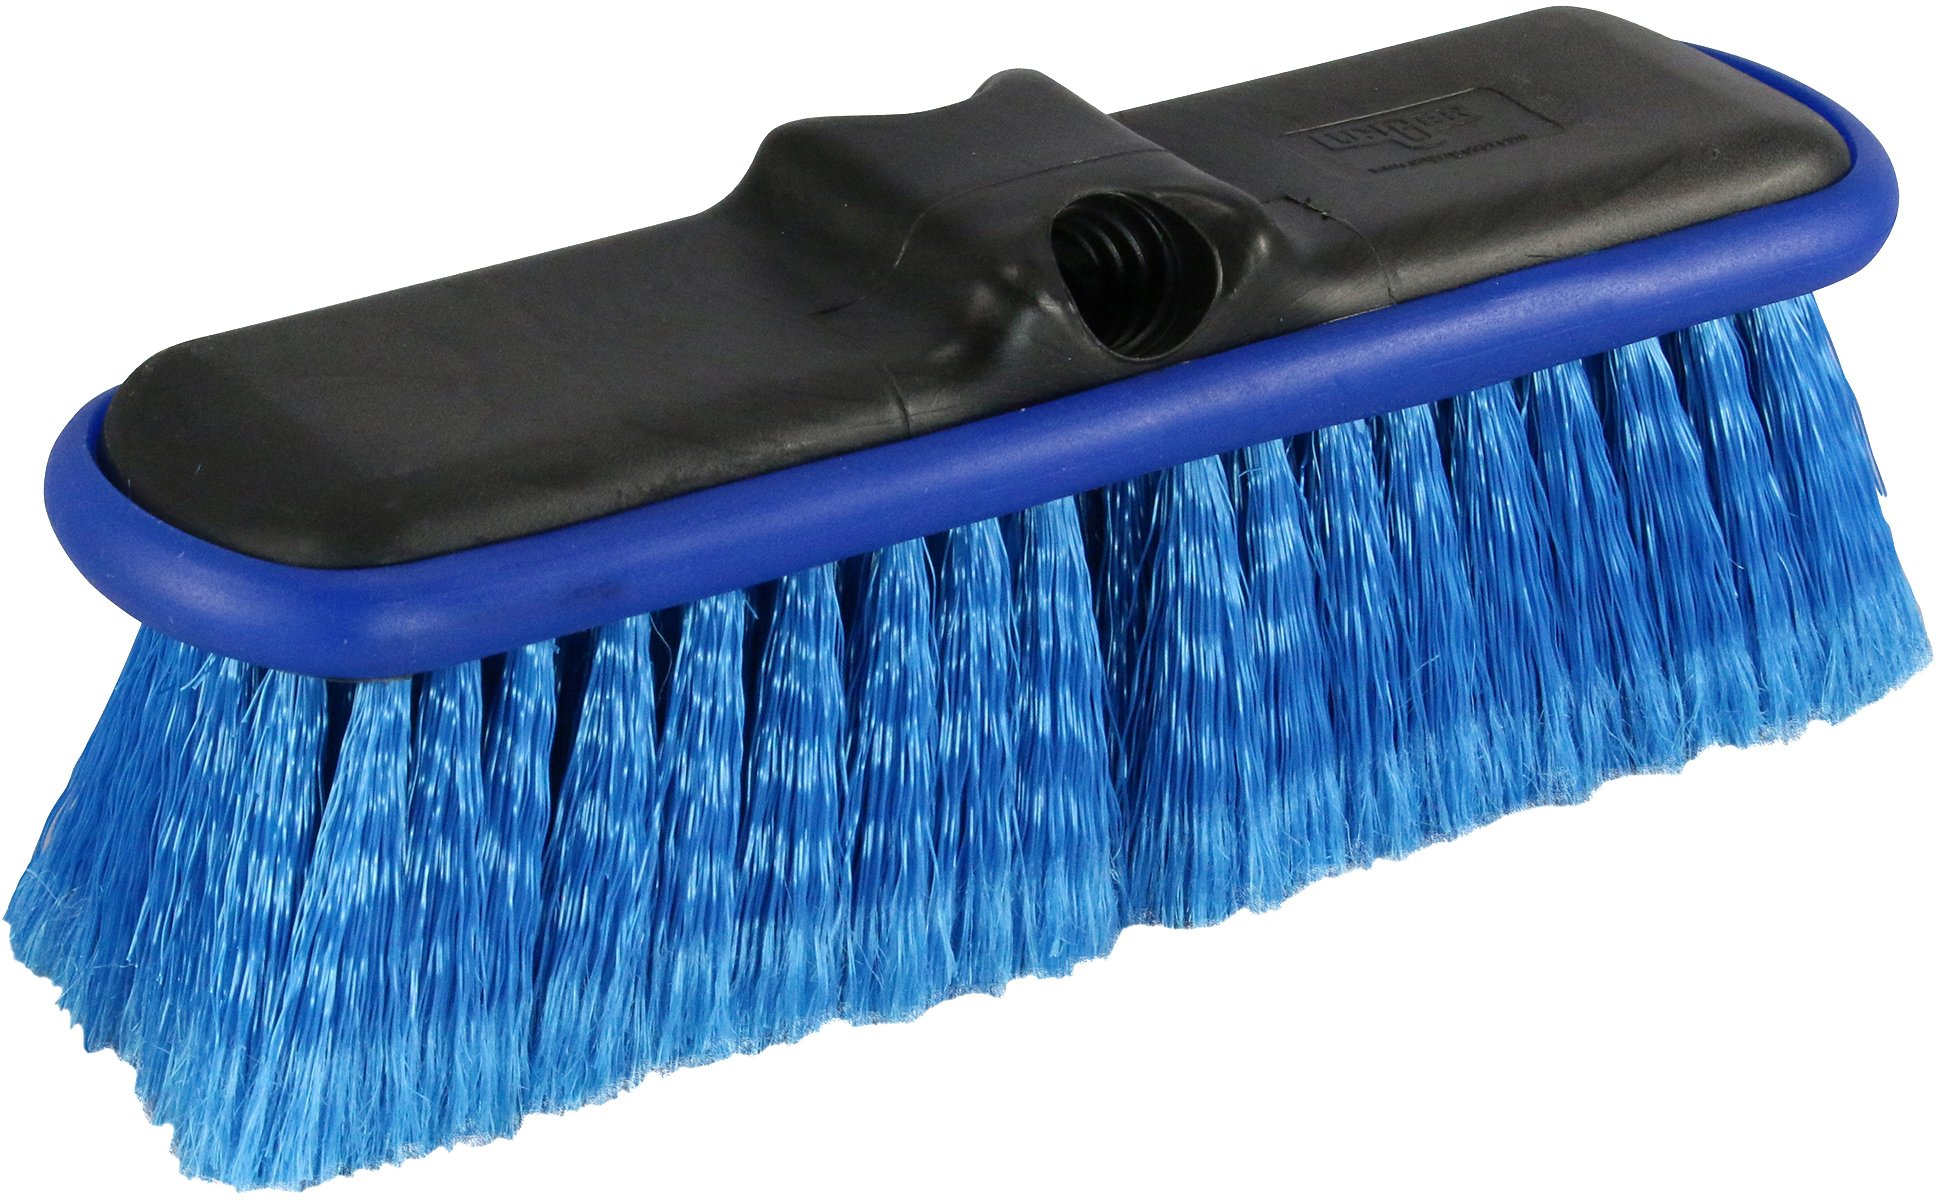 Unger Professional HydroPower Wash Brush, 9''